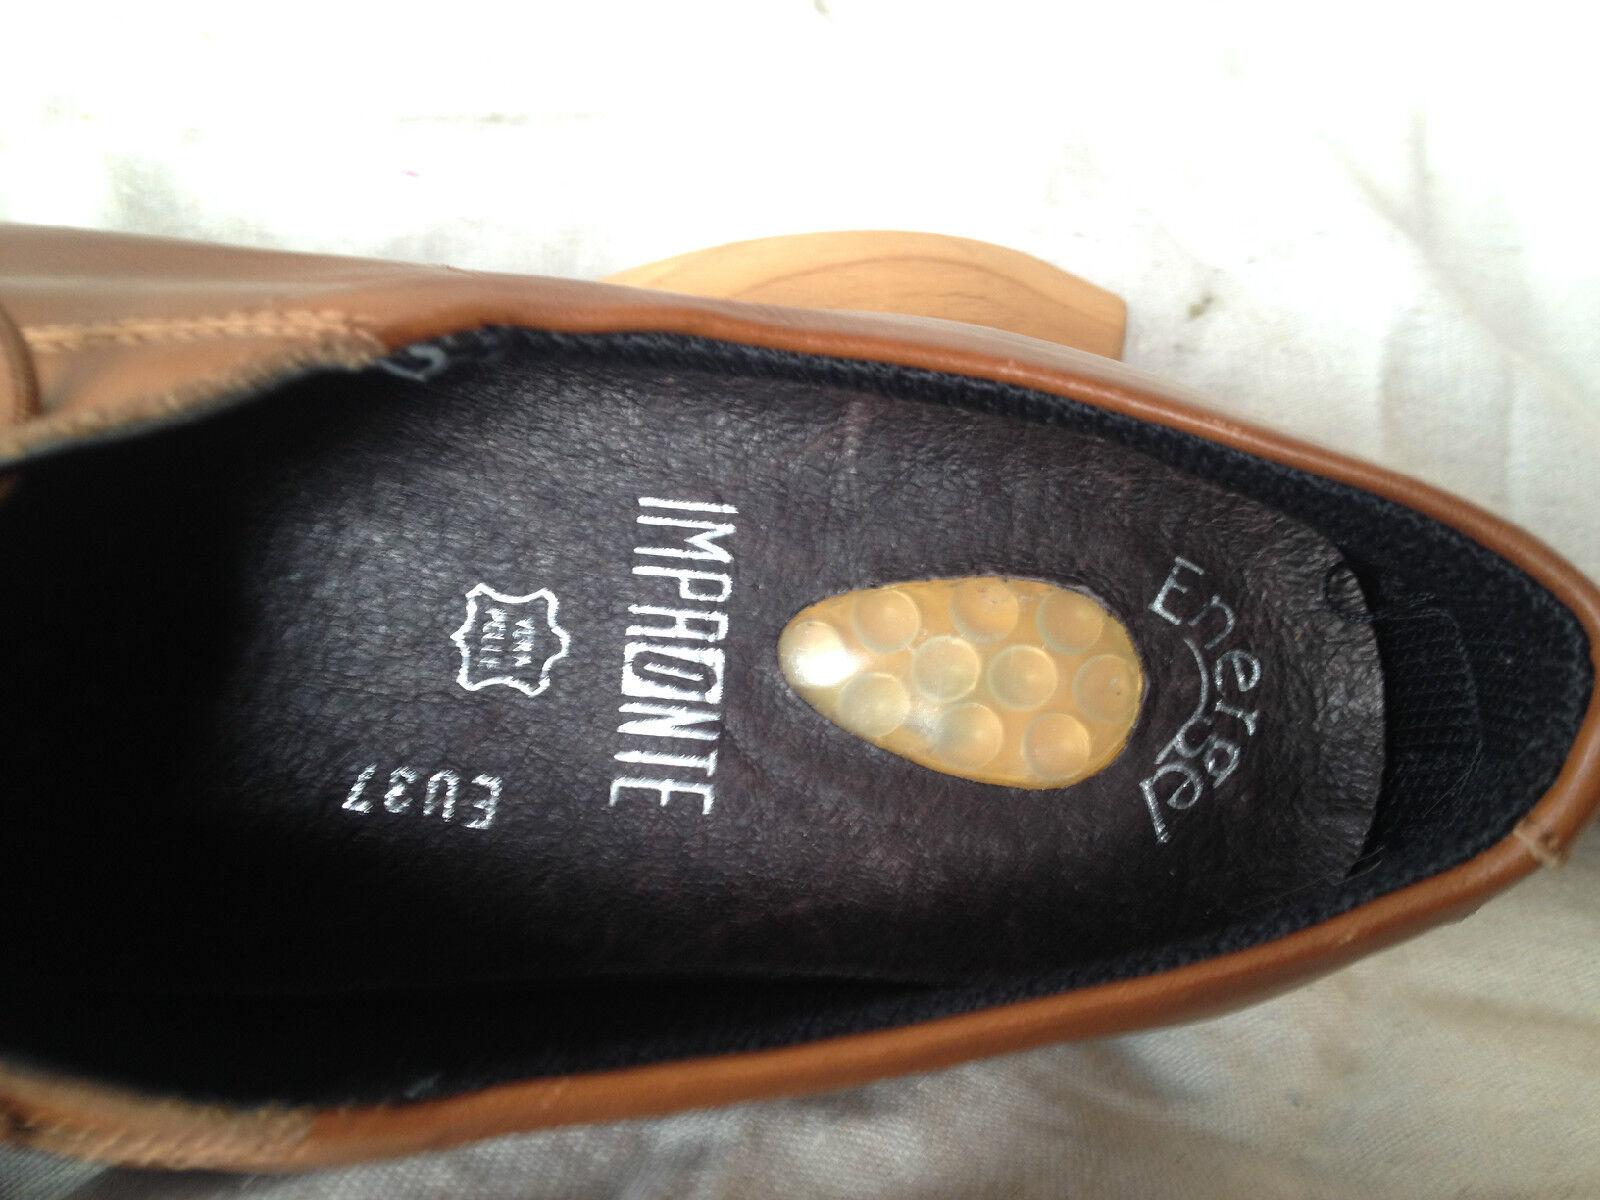 IMPRONTE Calzature Italian 37 Walking Comfort Driving 37 Italian 6.5 Shoe 282367